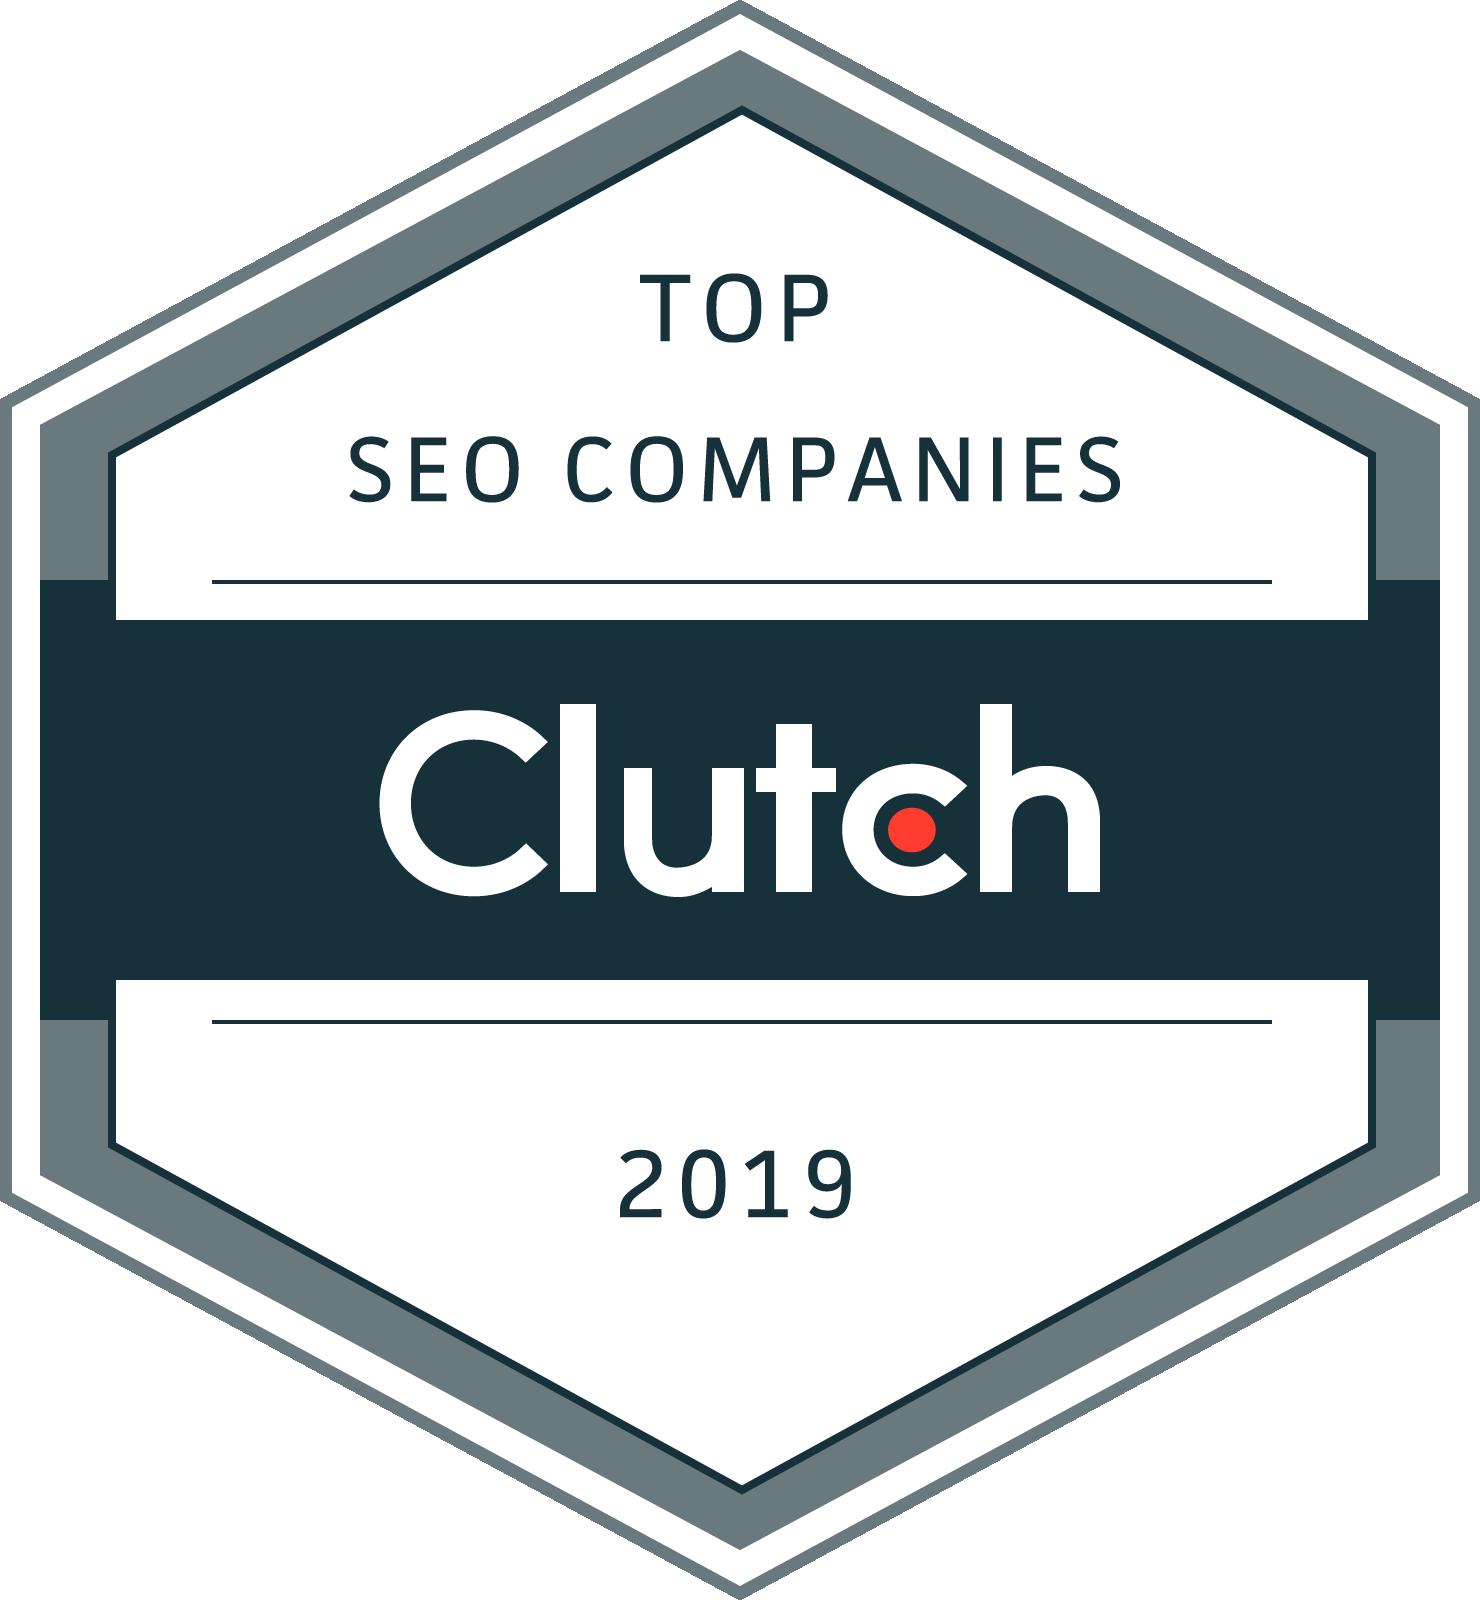 Top SEO Companies Award 2019